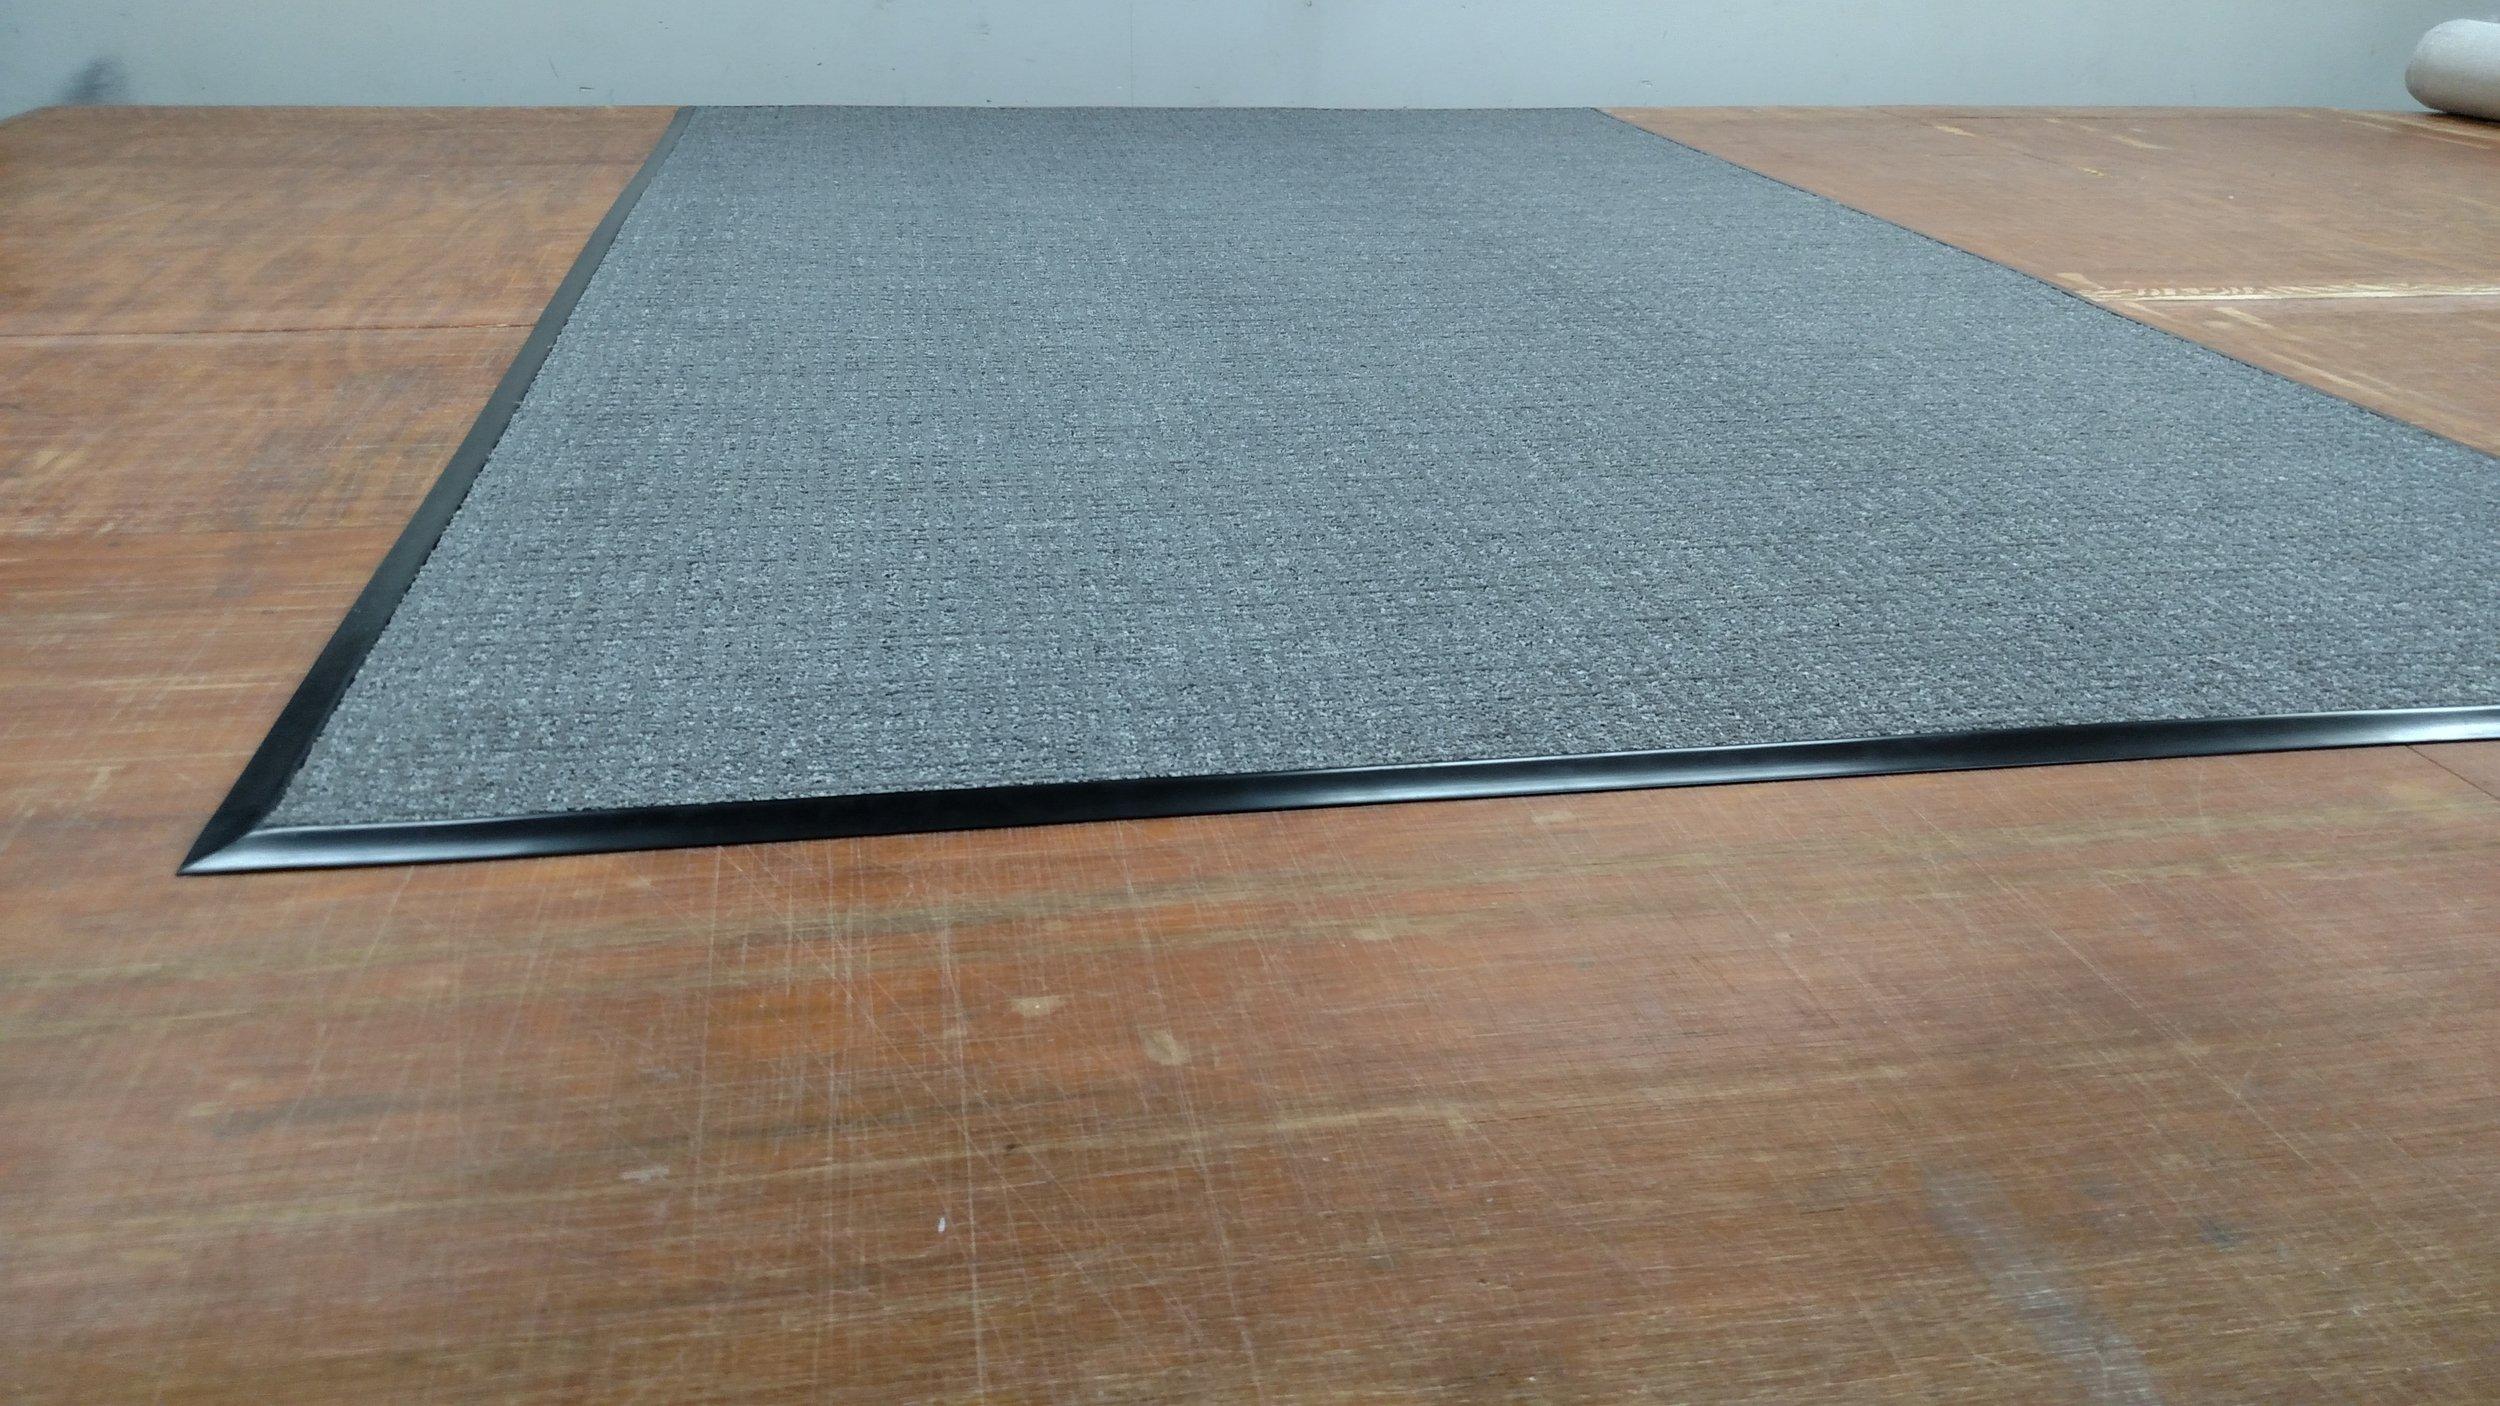 Reducer edged rug2.jpg